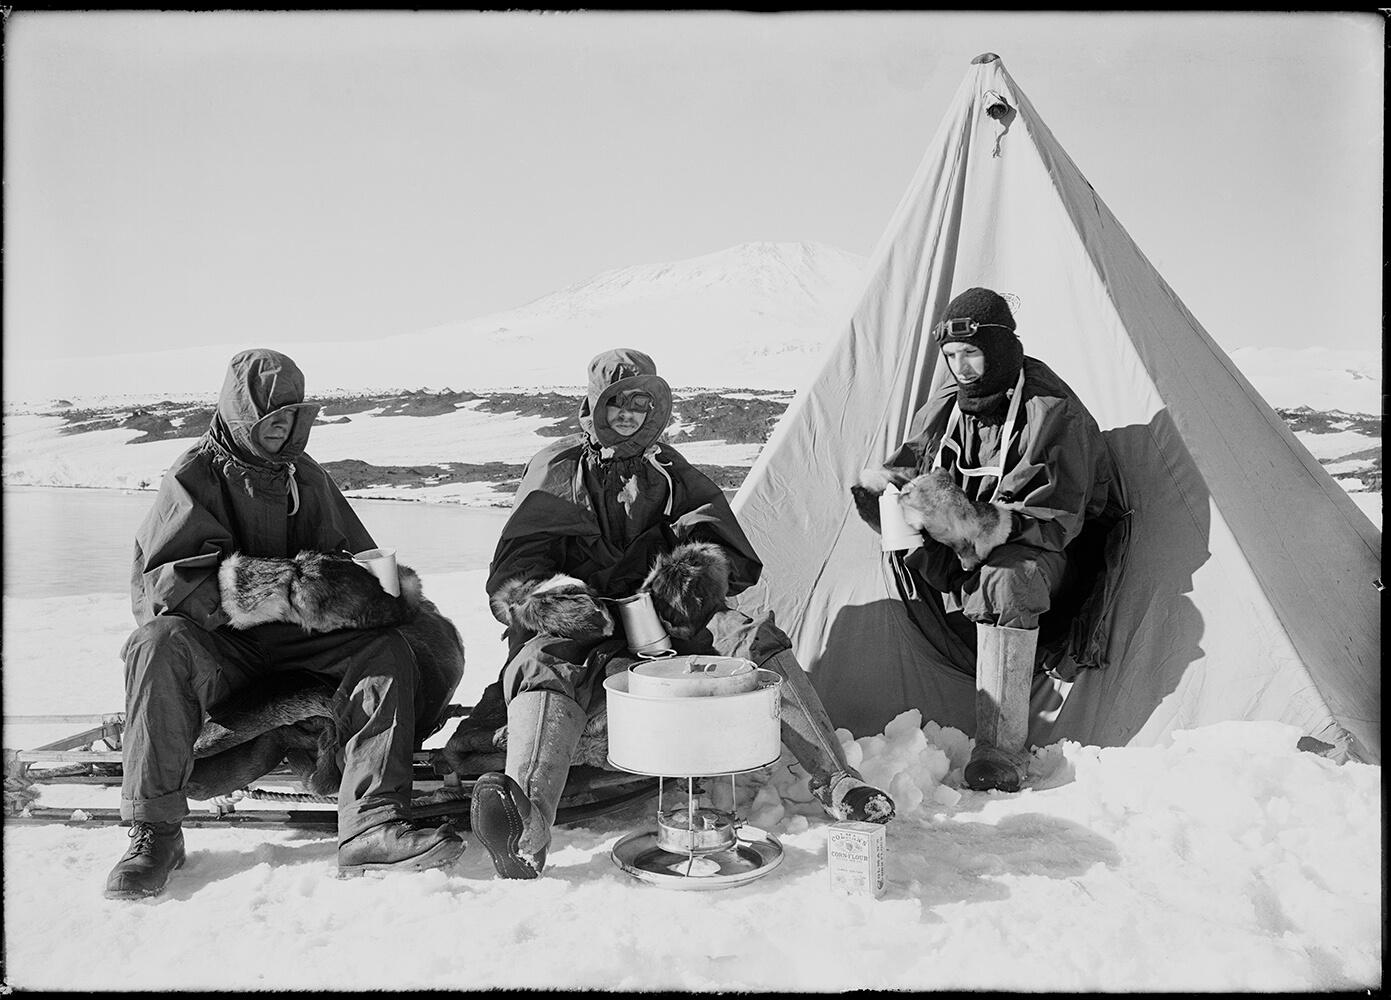 Terra Nova Expedition fine art photography